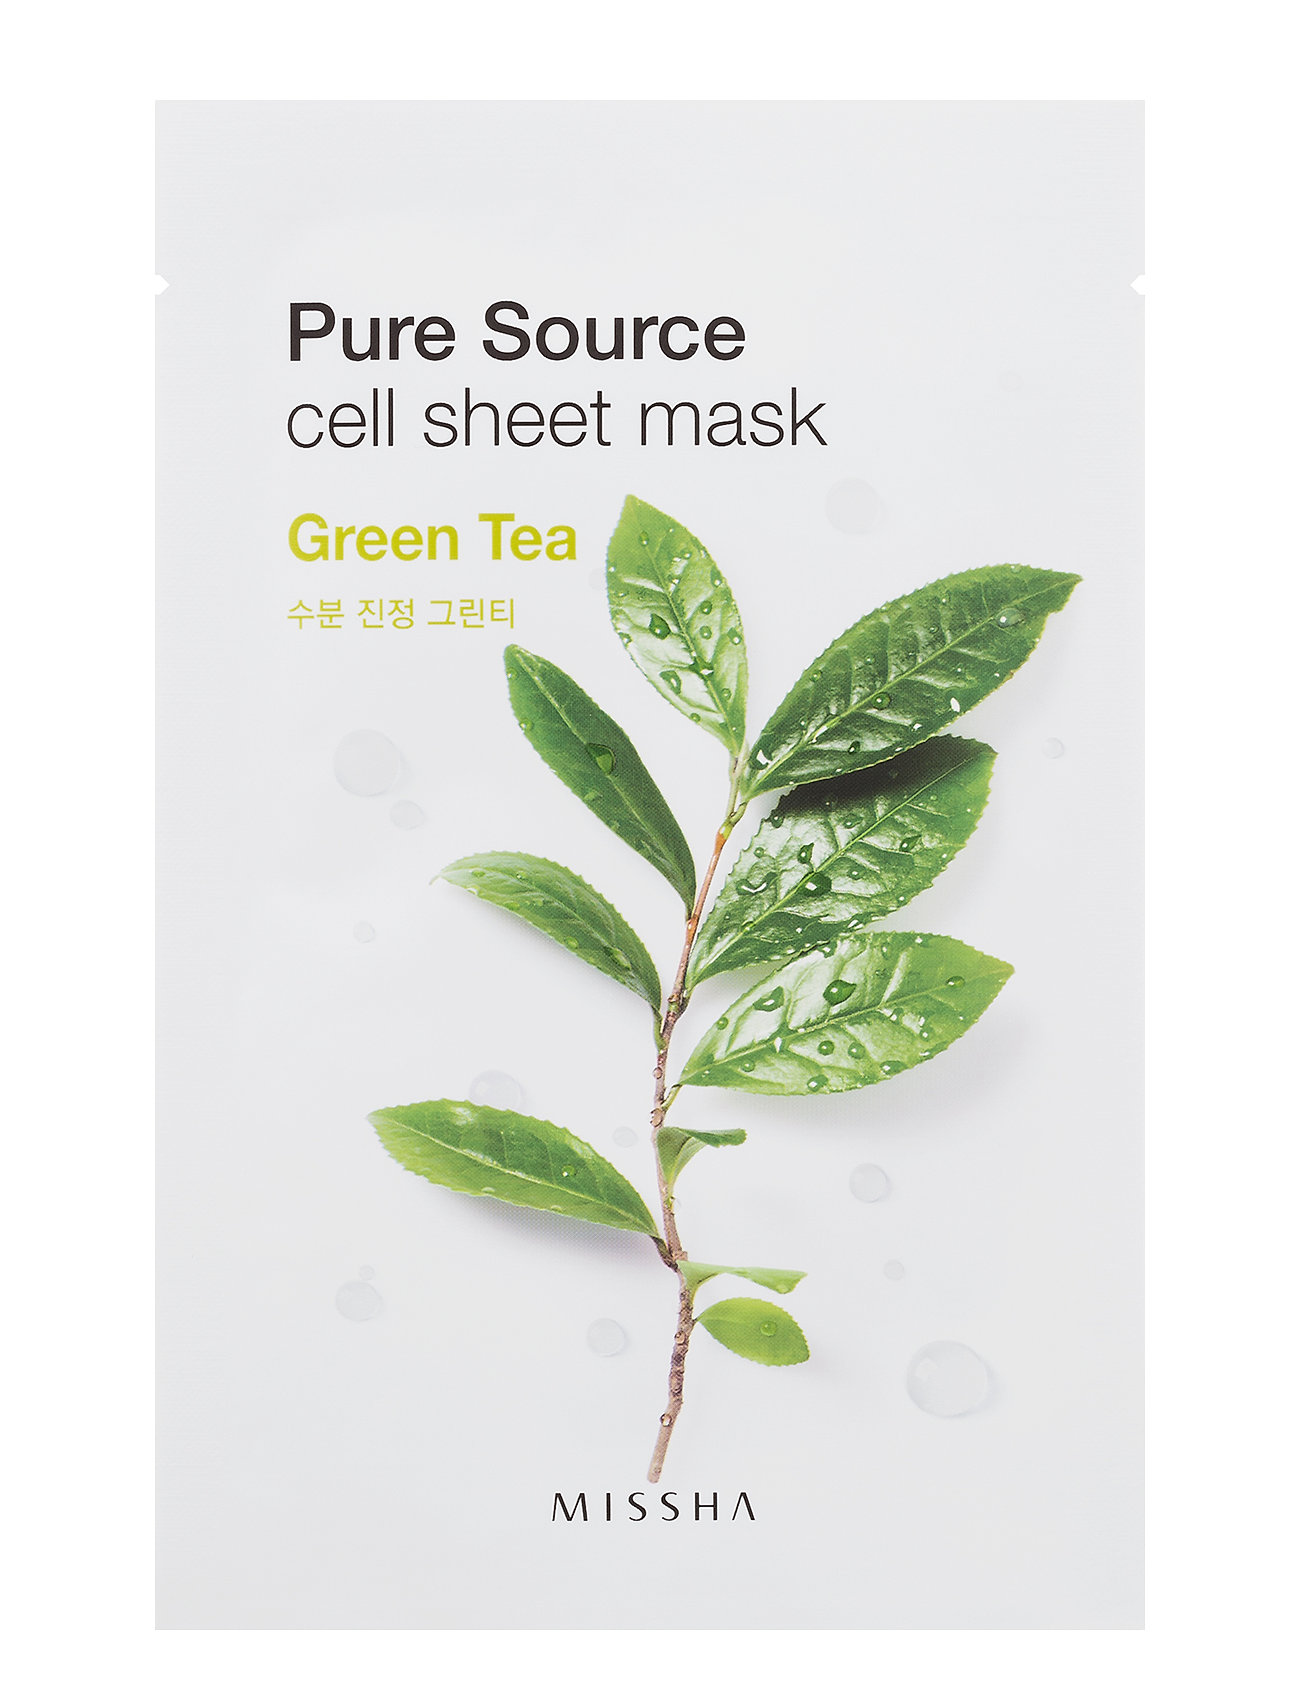 Missha Pure Source Cell Sheet Mask (Green Tea) - Missha